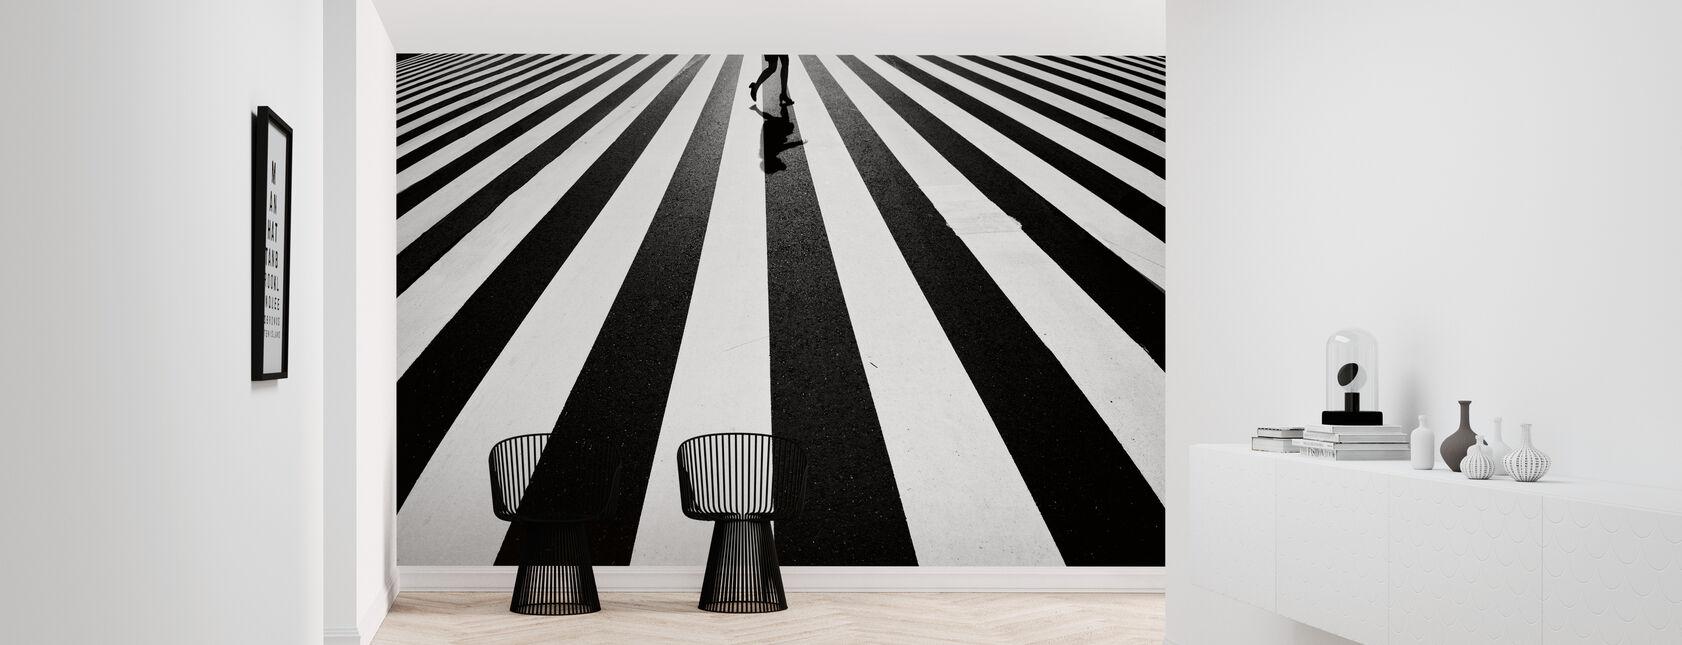 Black and White - Wallpaper - Hallway